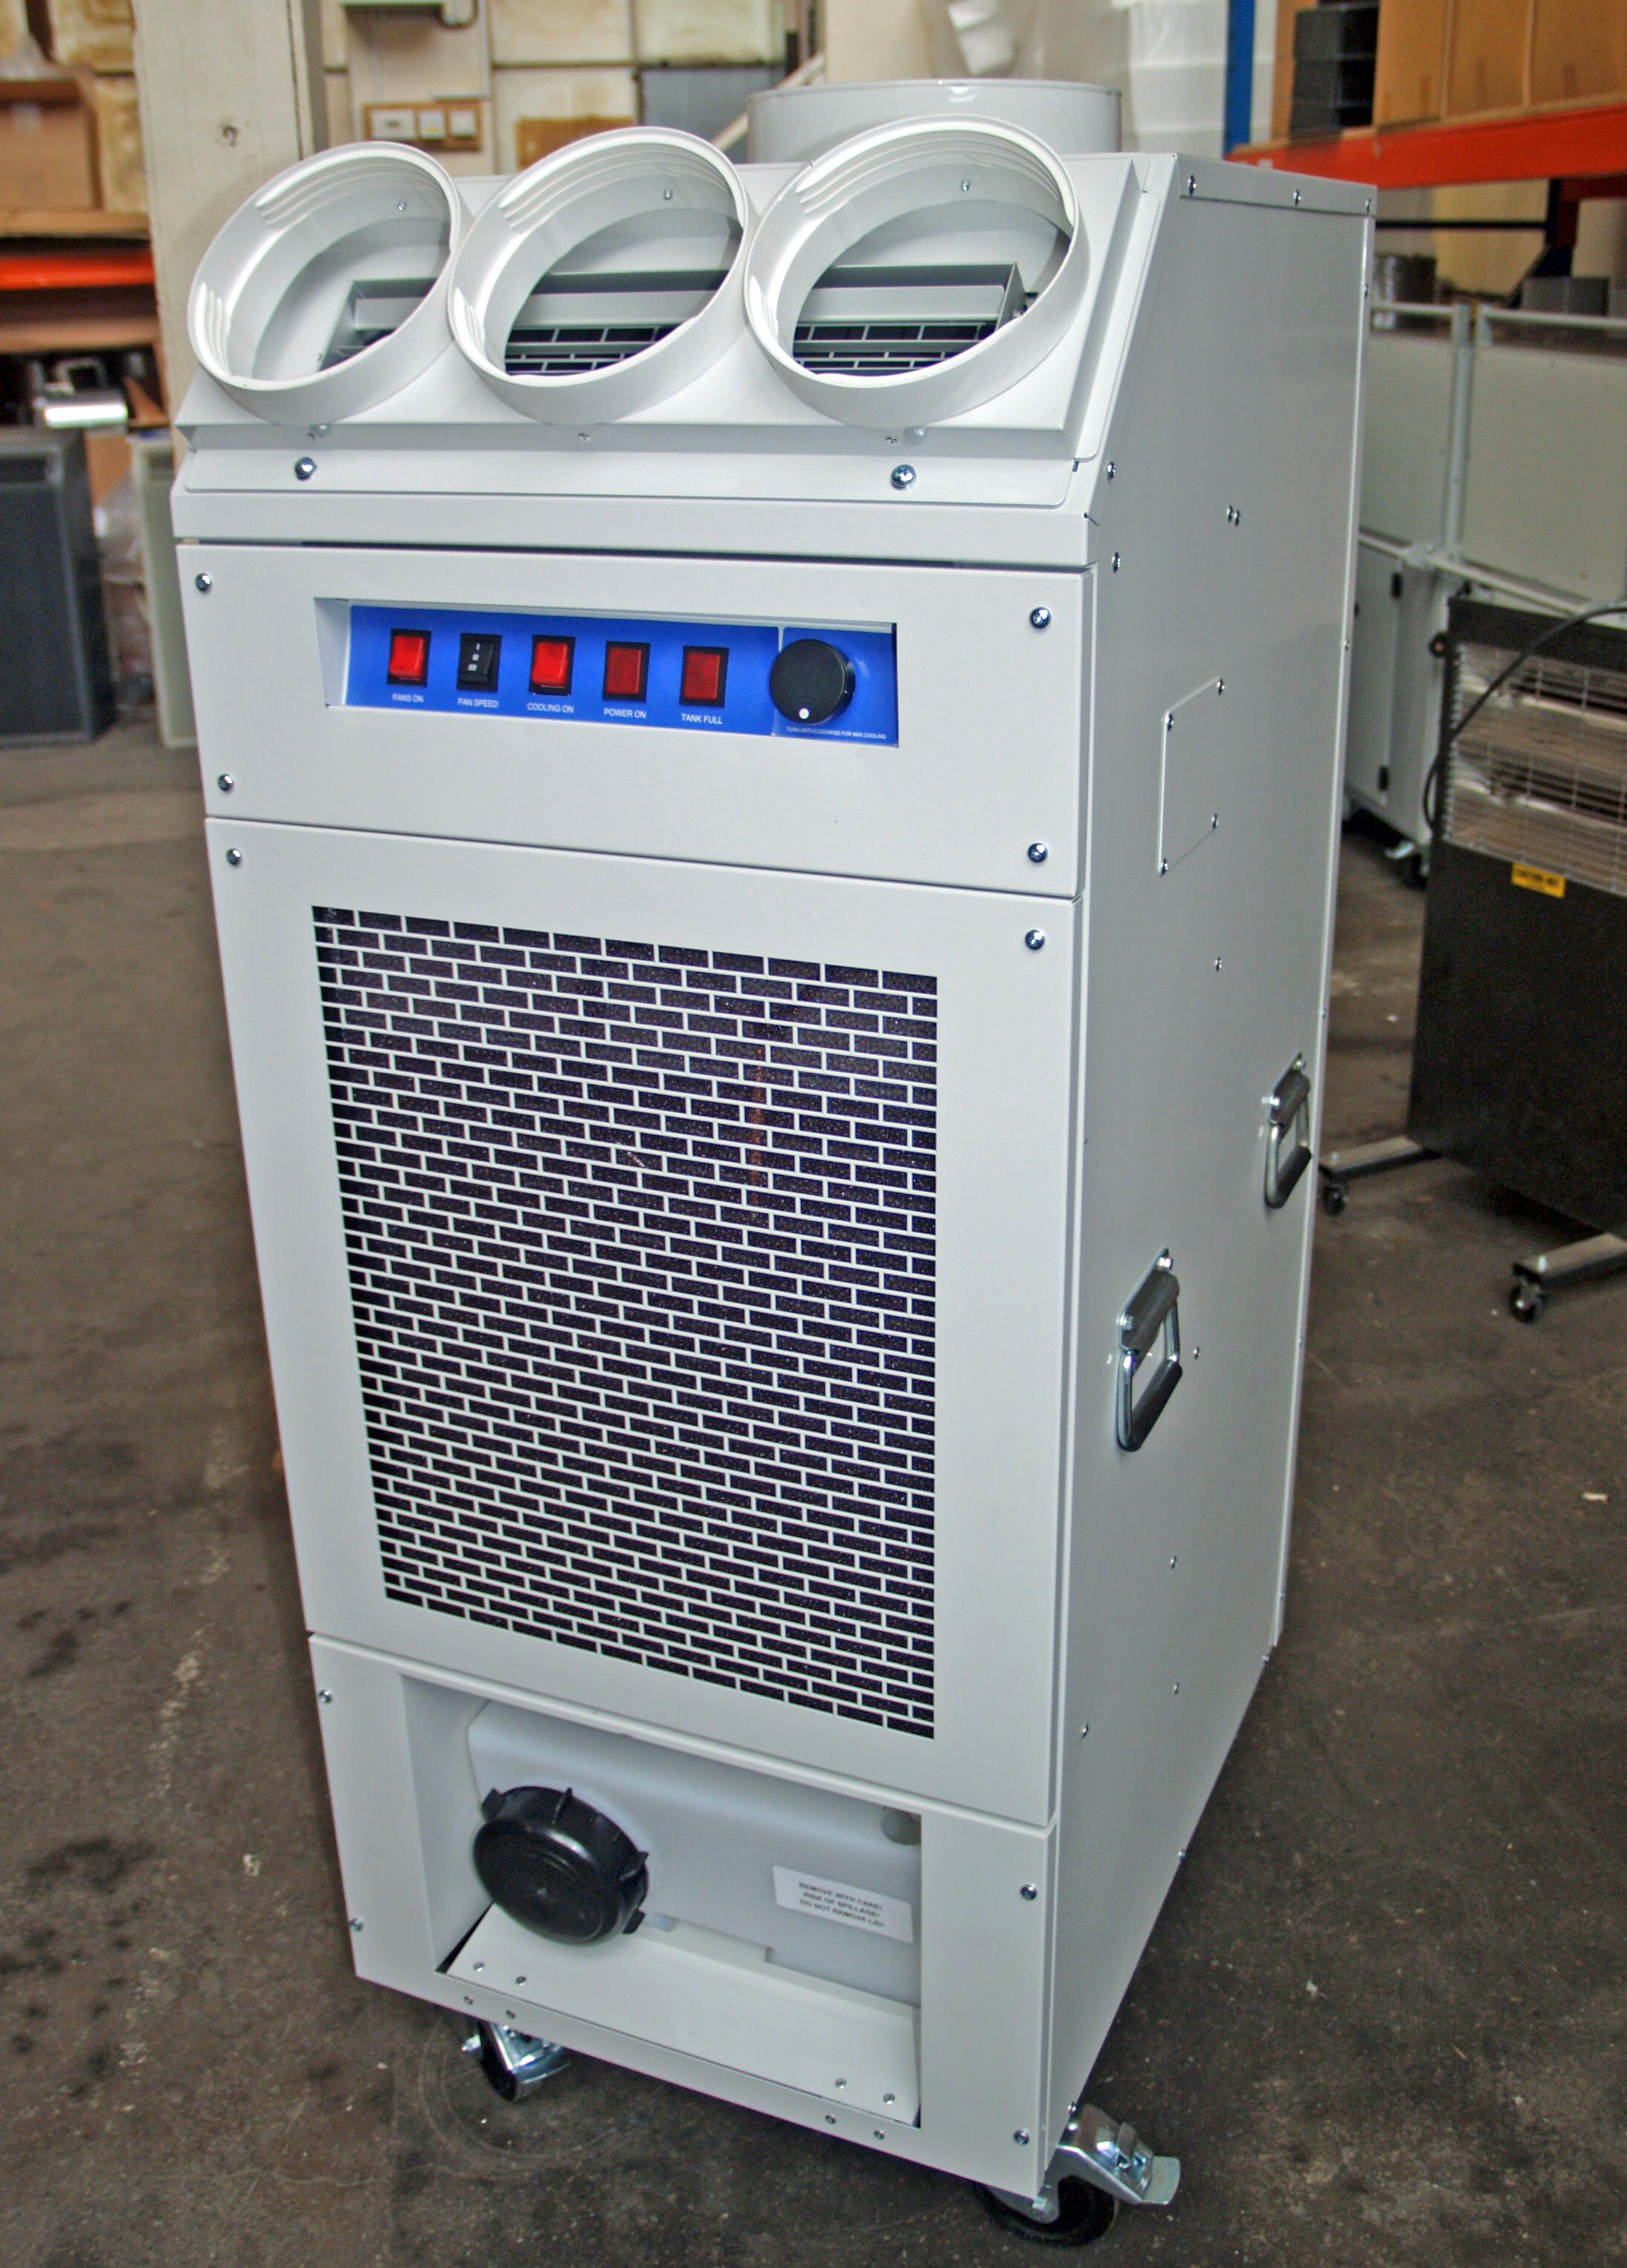 Industrial Portable Air Conditioner KCA28 28000btu #174AB4